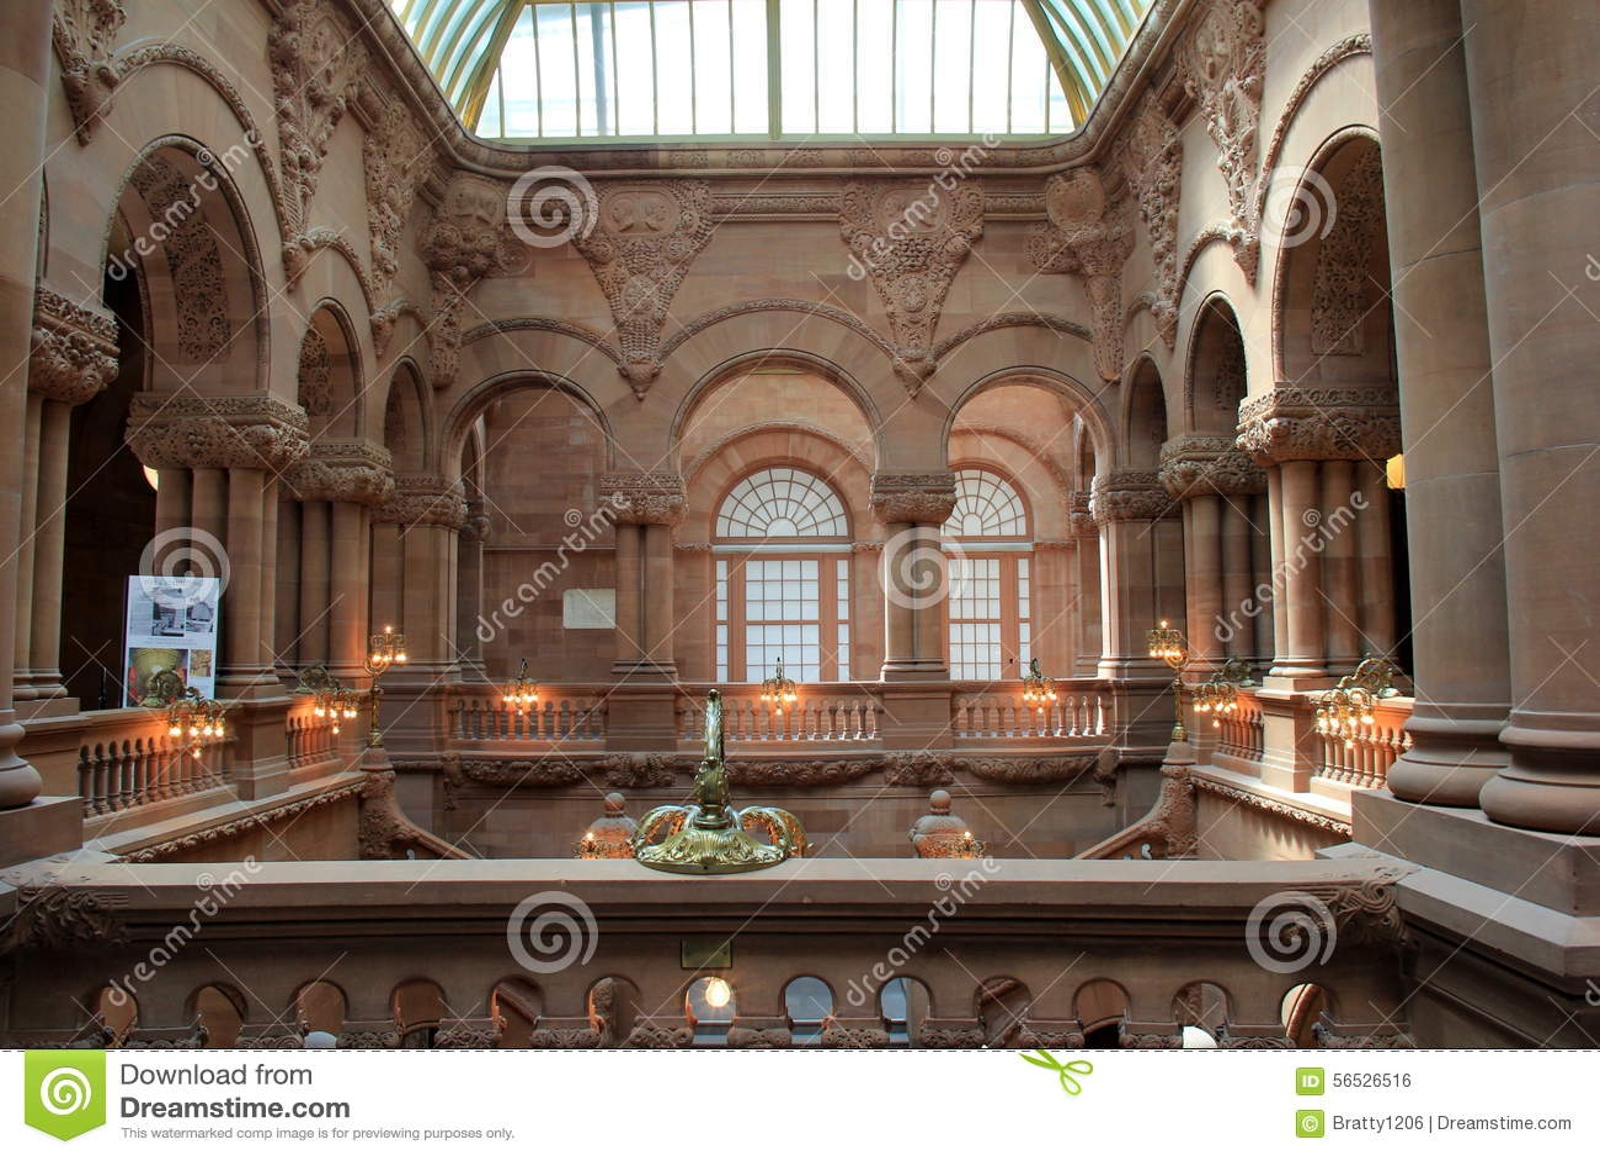 Impressive Architecture Inside New York State Capitol